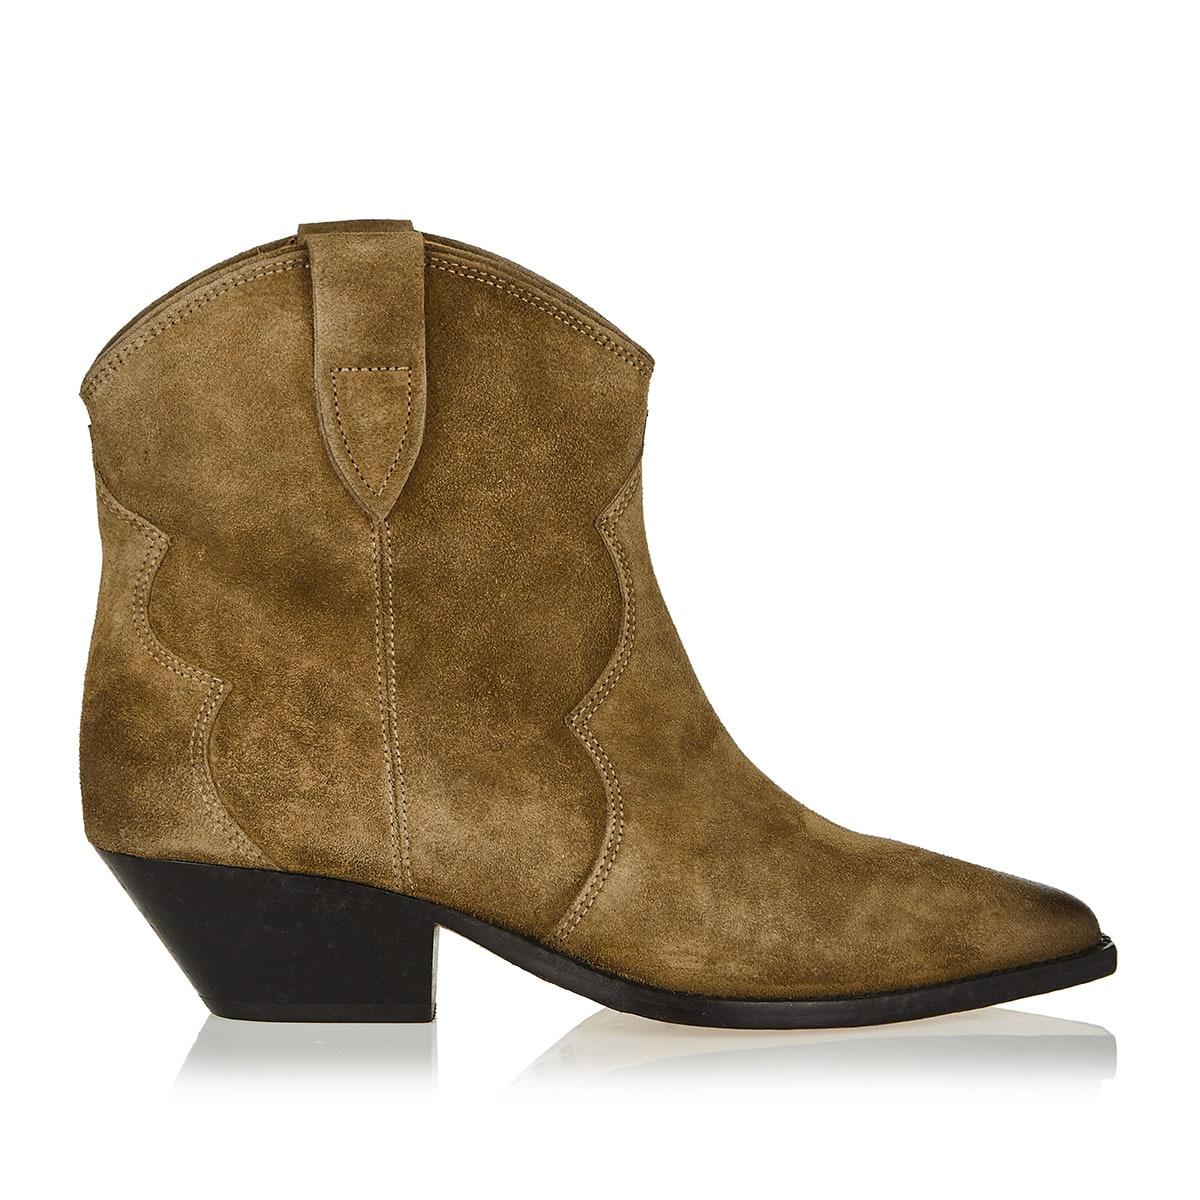 Dewina cowboy suede ankle boots